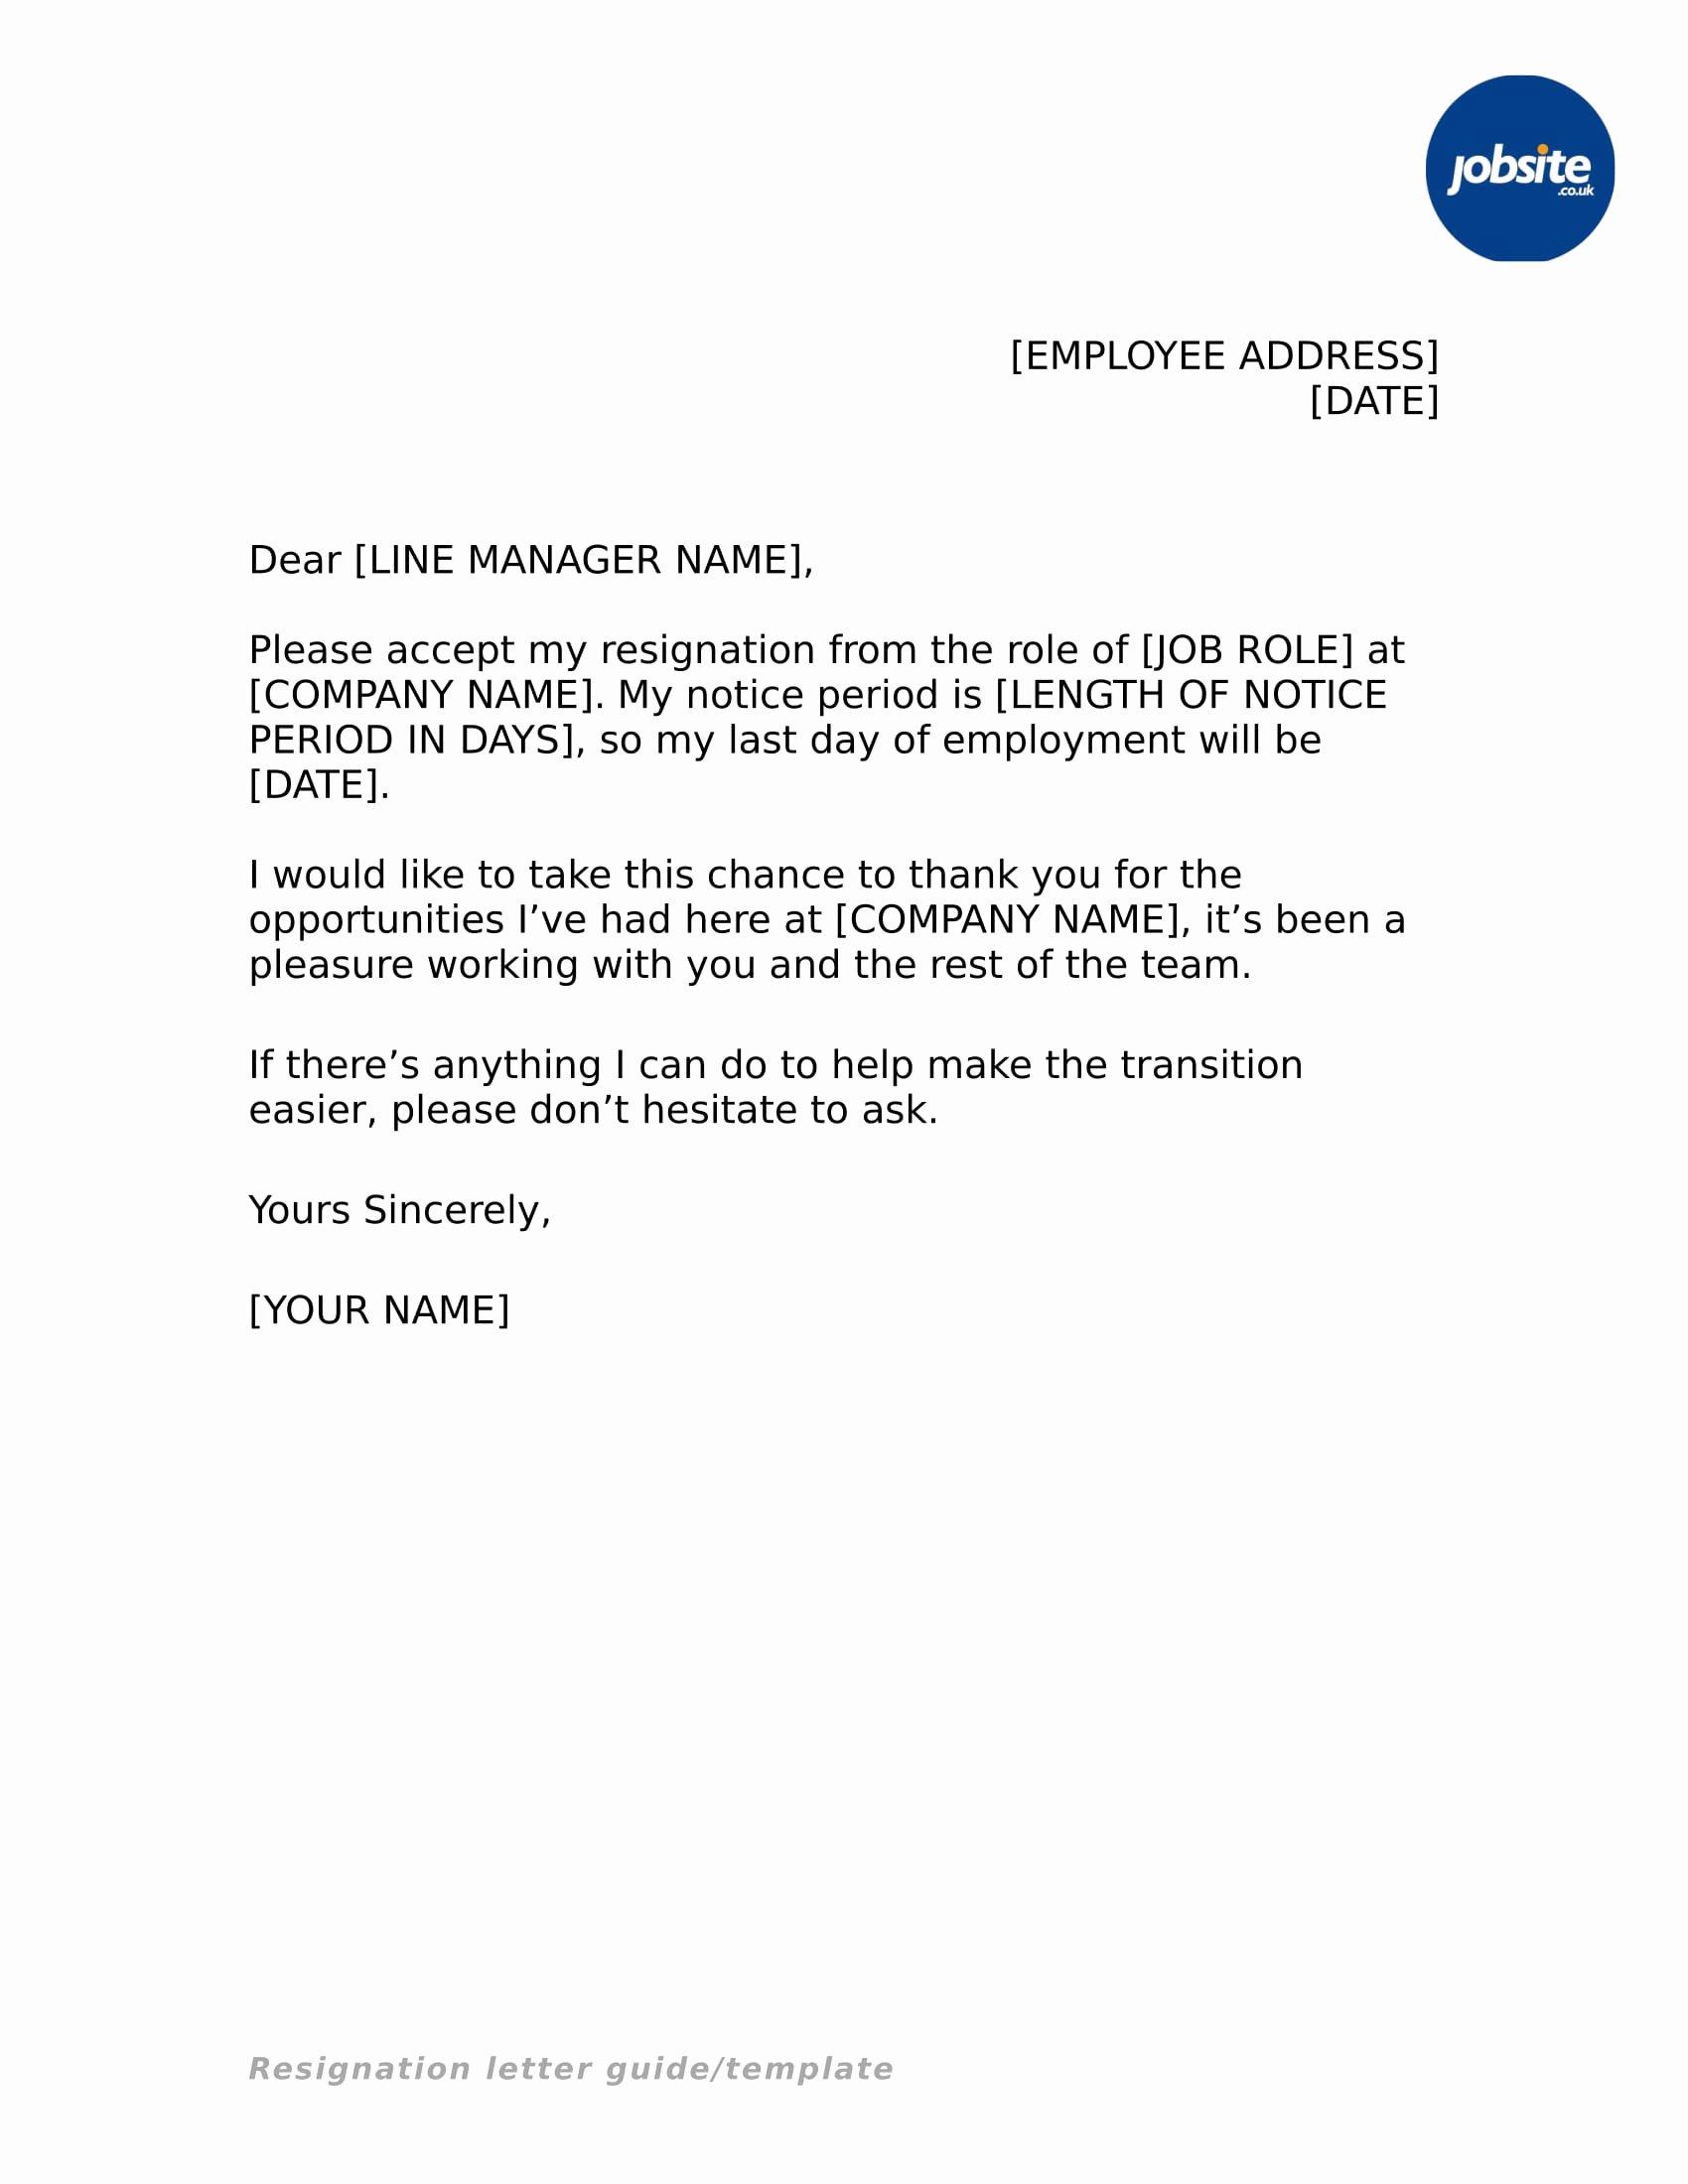 Simple Resignation Letter Templates Unique 35 Simple Resignation Letter Examples Pdf Word